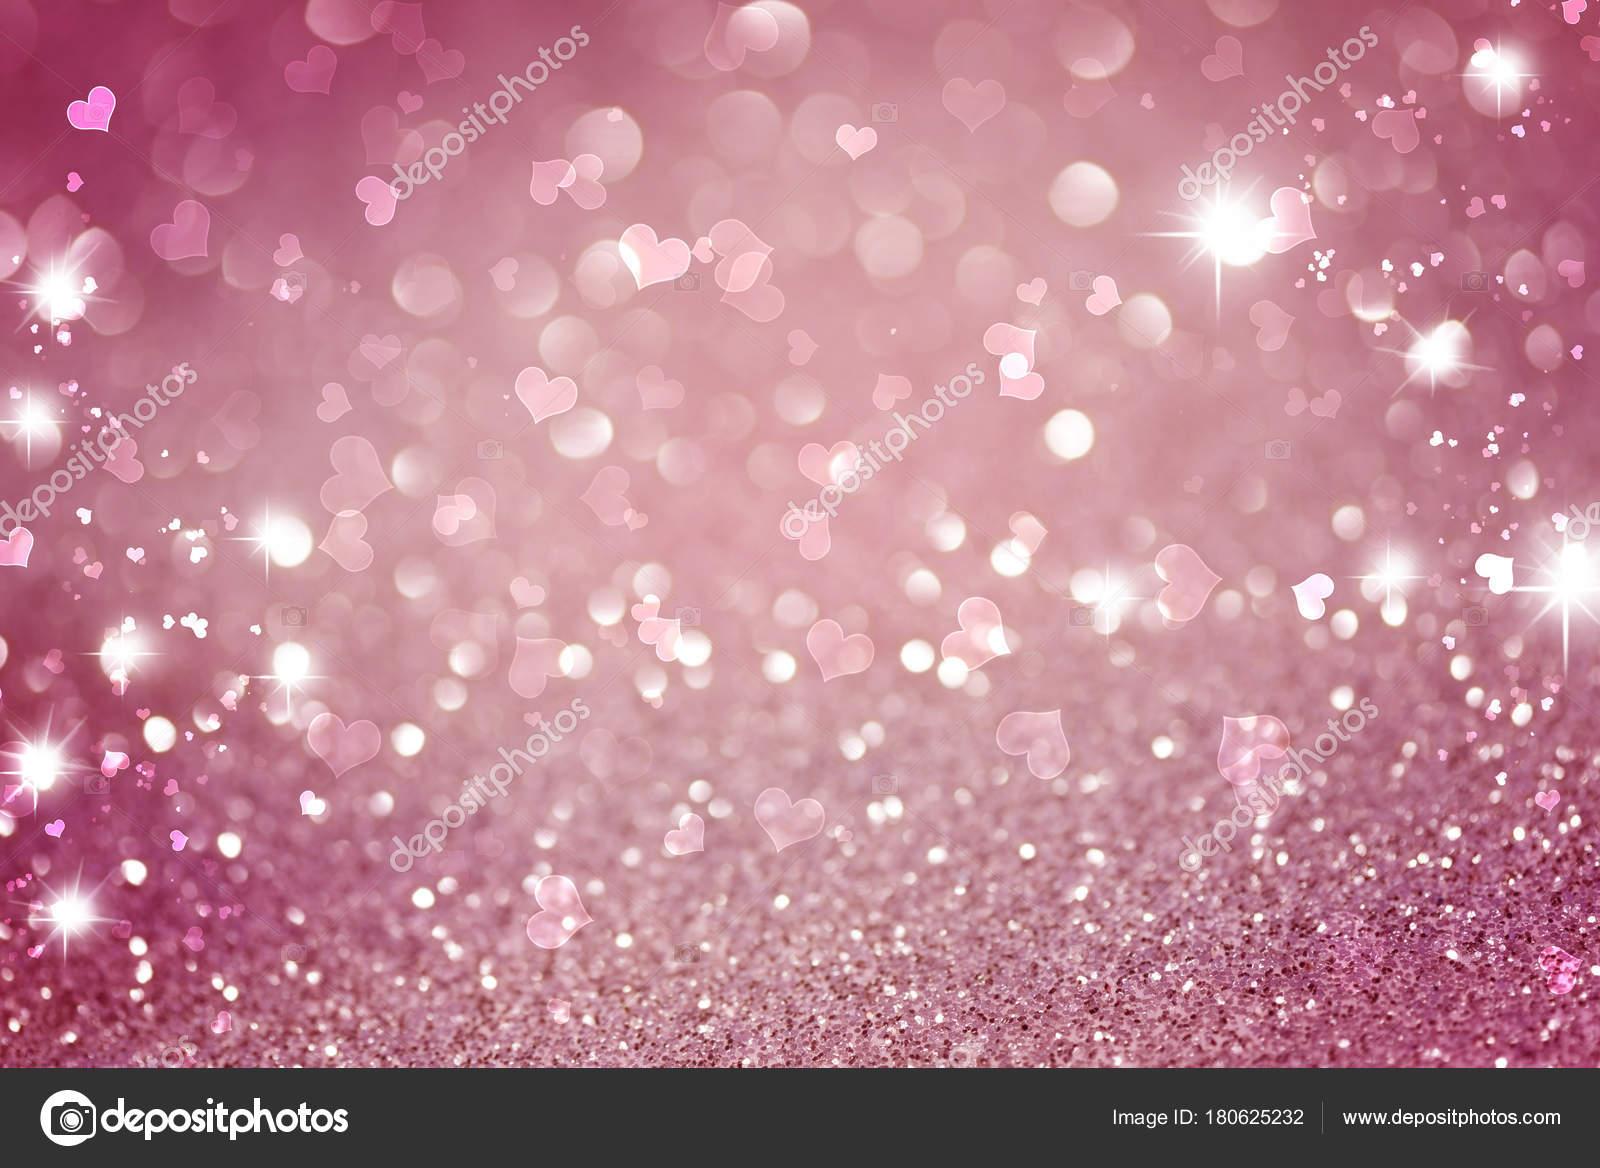 depositphotos 180625232 stock photo pink white glittering christmas lights